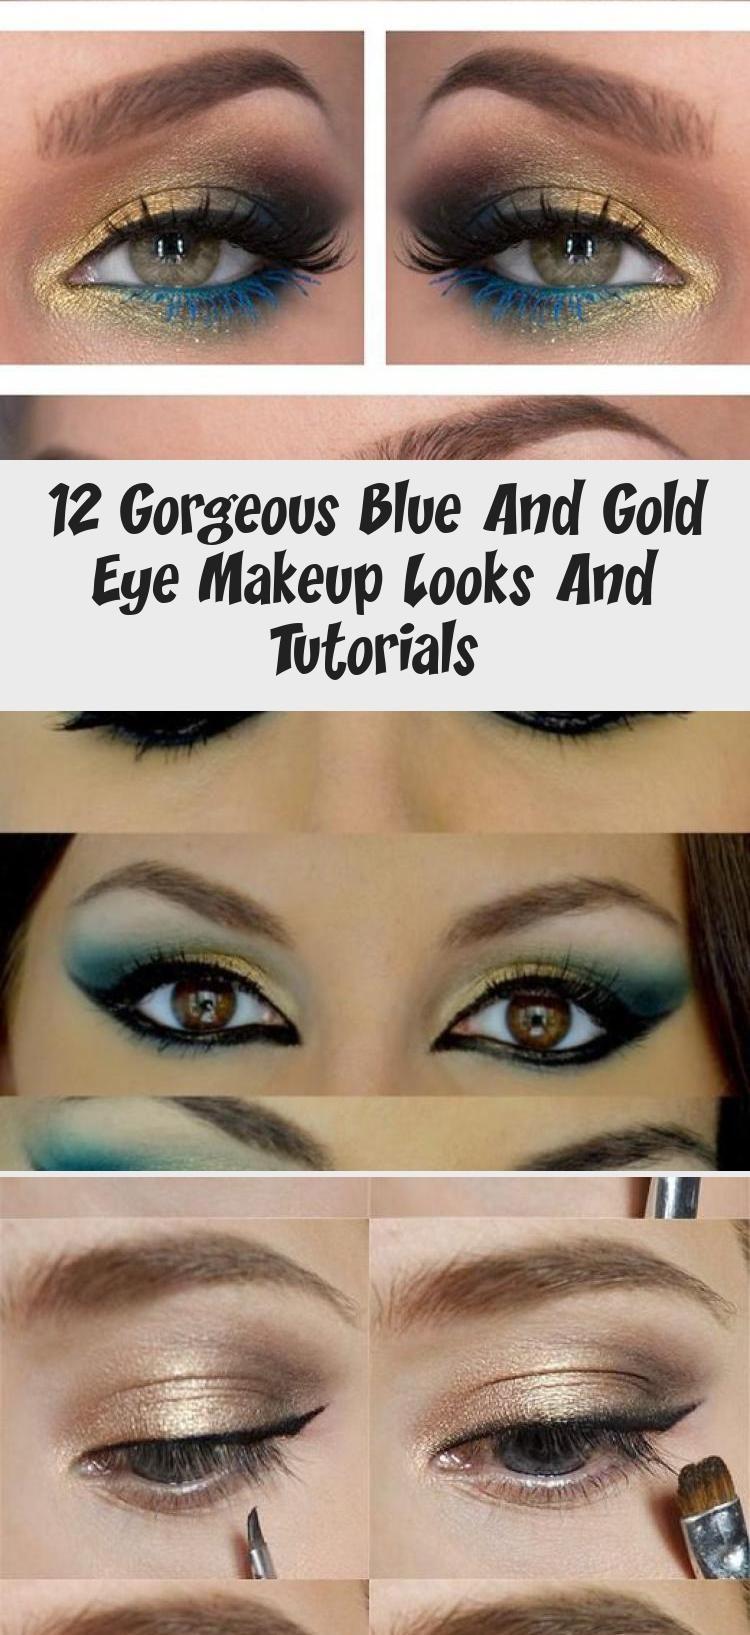 #beauty #style #fashion #hair #makeup #skincare #nails #health #fitness #exercise #EyemakeupOrange #...